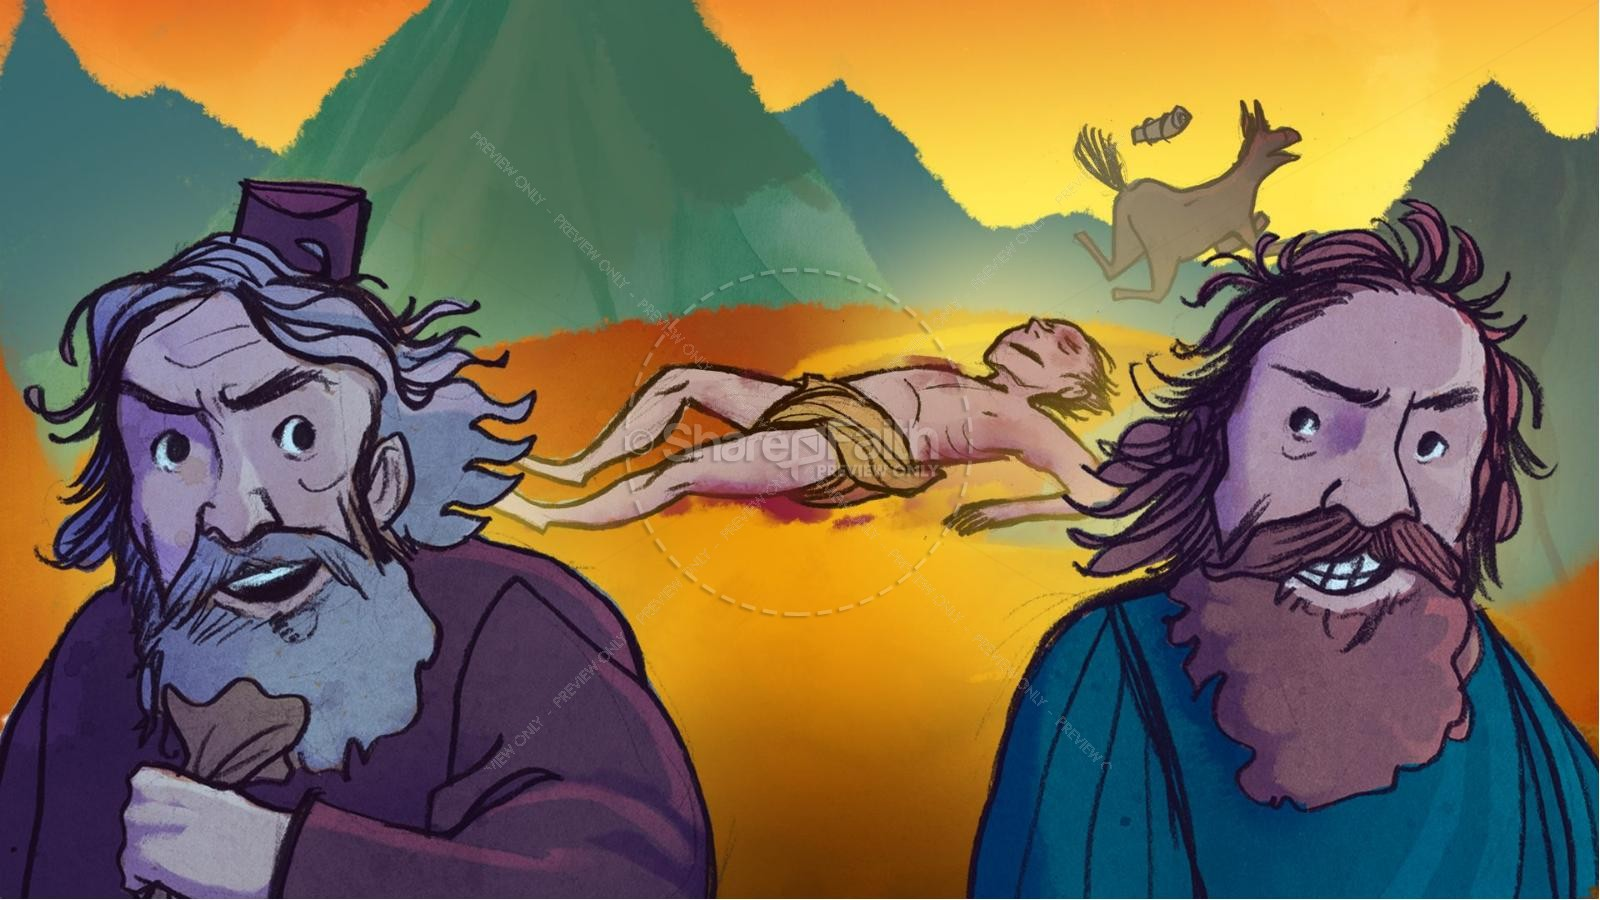 Ezekiel Bible Stories For Kids